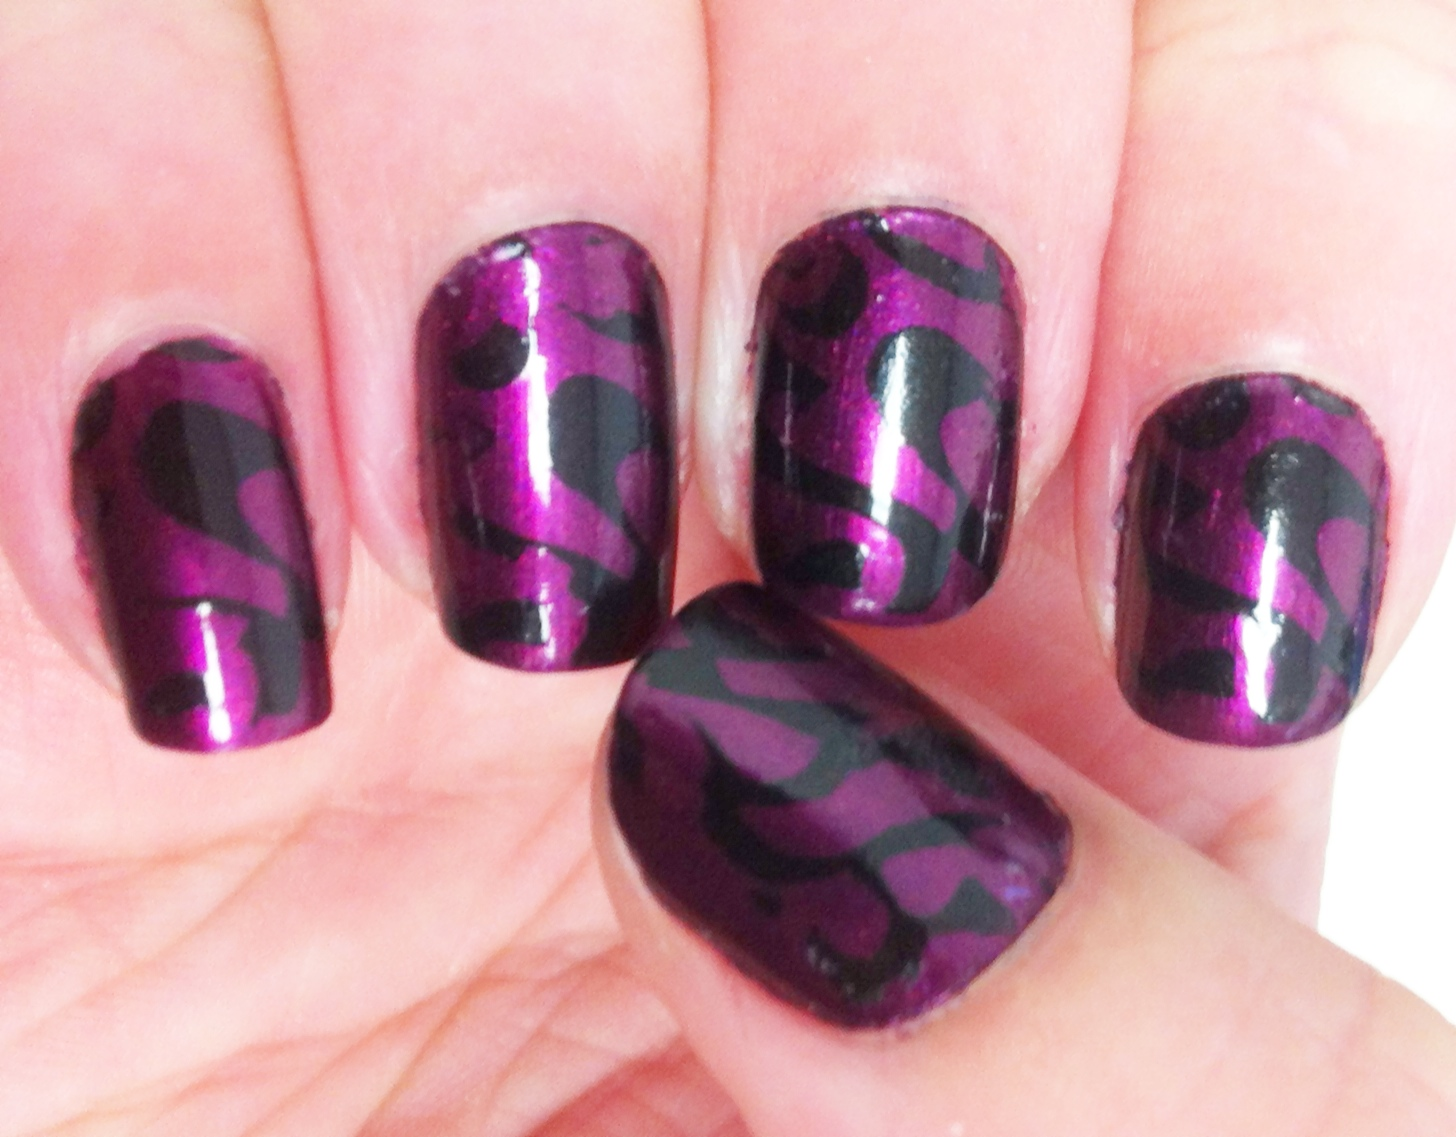 Nail Designs Purple Black: D art and sticker fun on dark purple ...